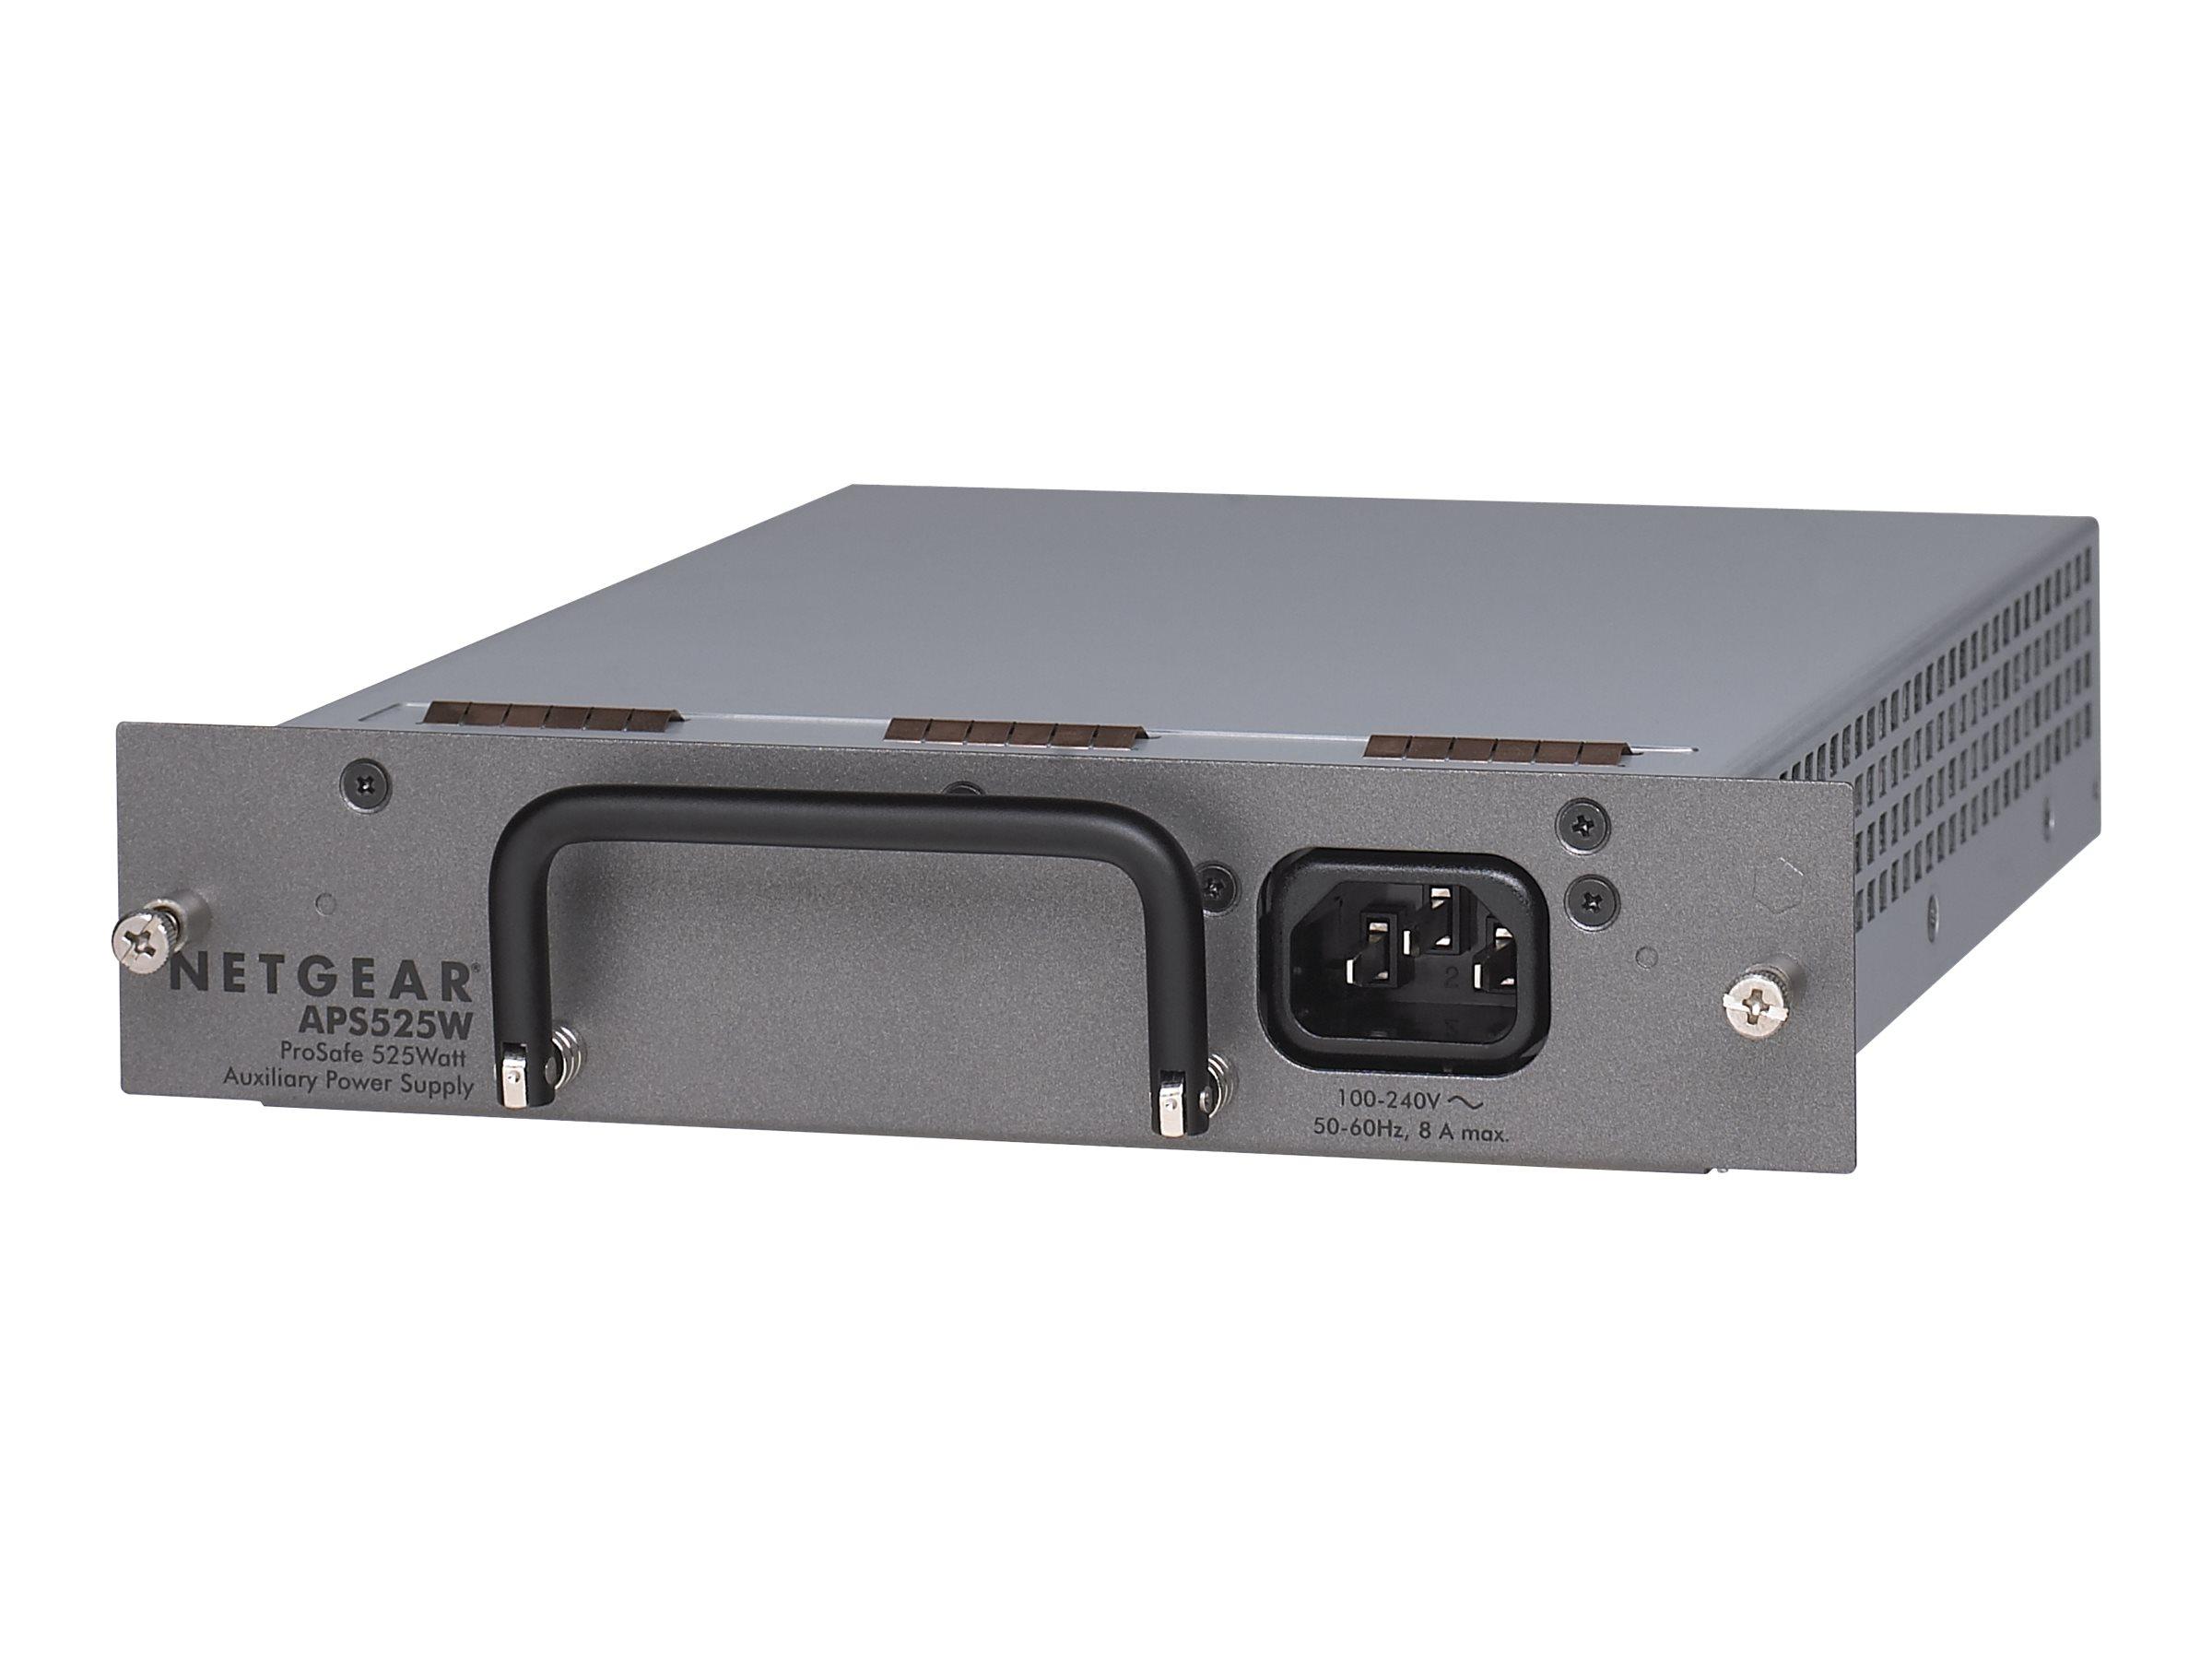 NETGEAR Prosafe APS300W Auxiliary Power Supply - Stromversorgung redundant / Hot-Plug (Plug-In-Modul) - 300 Watt - für NETGEAR X